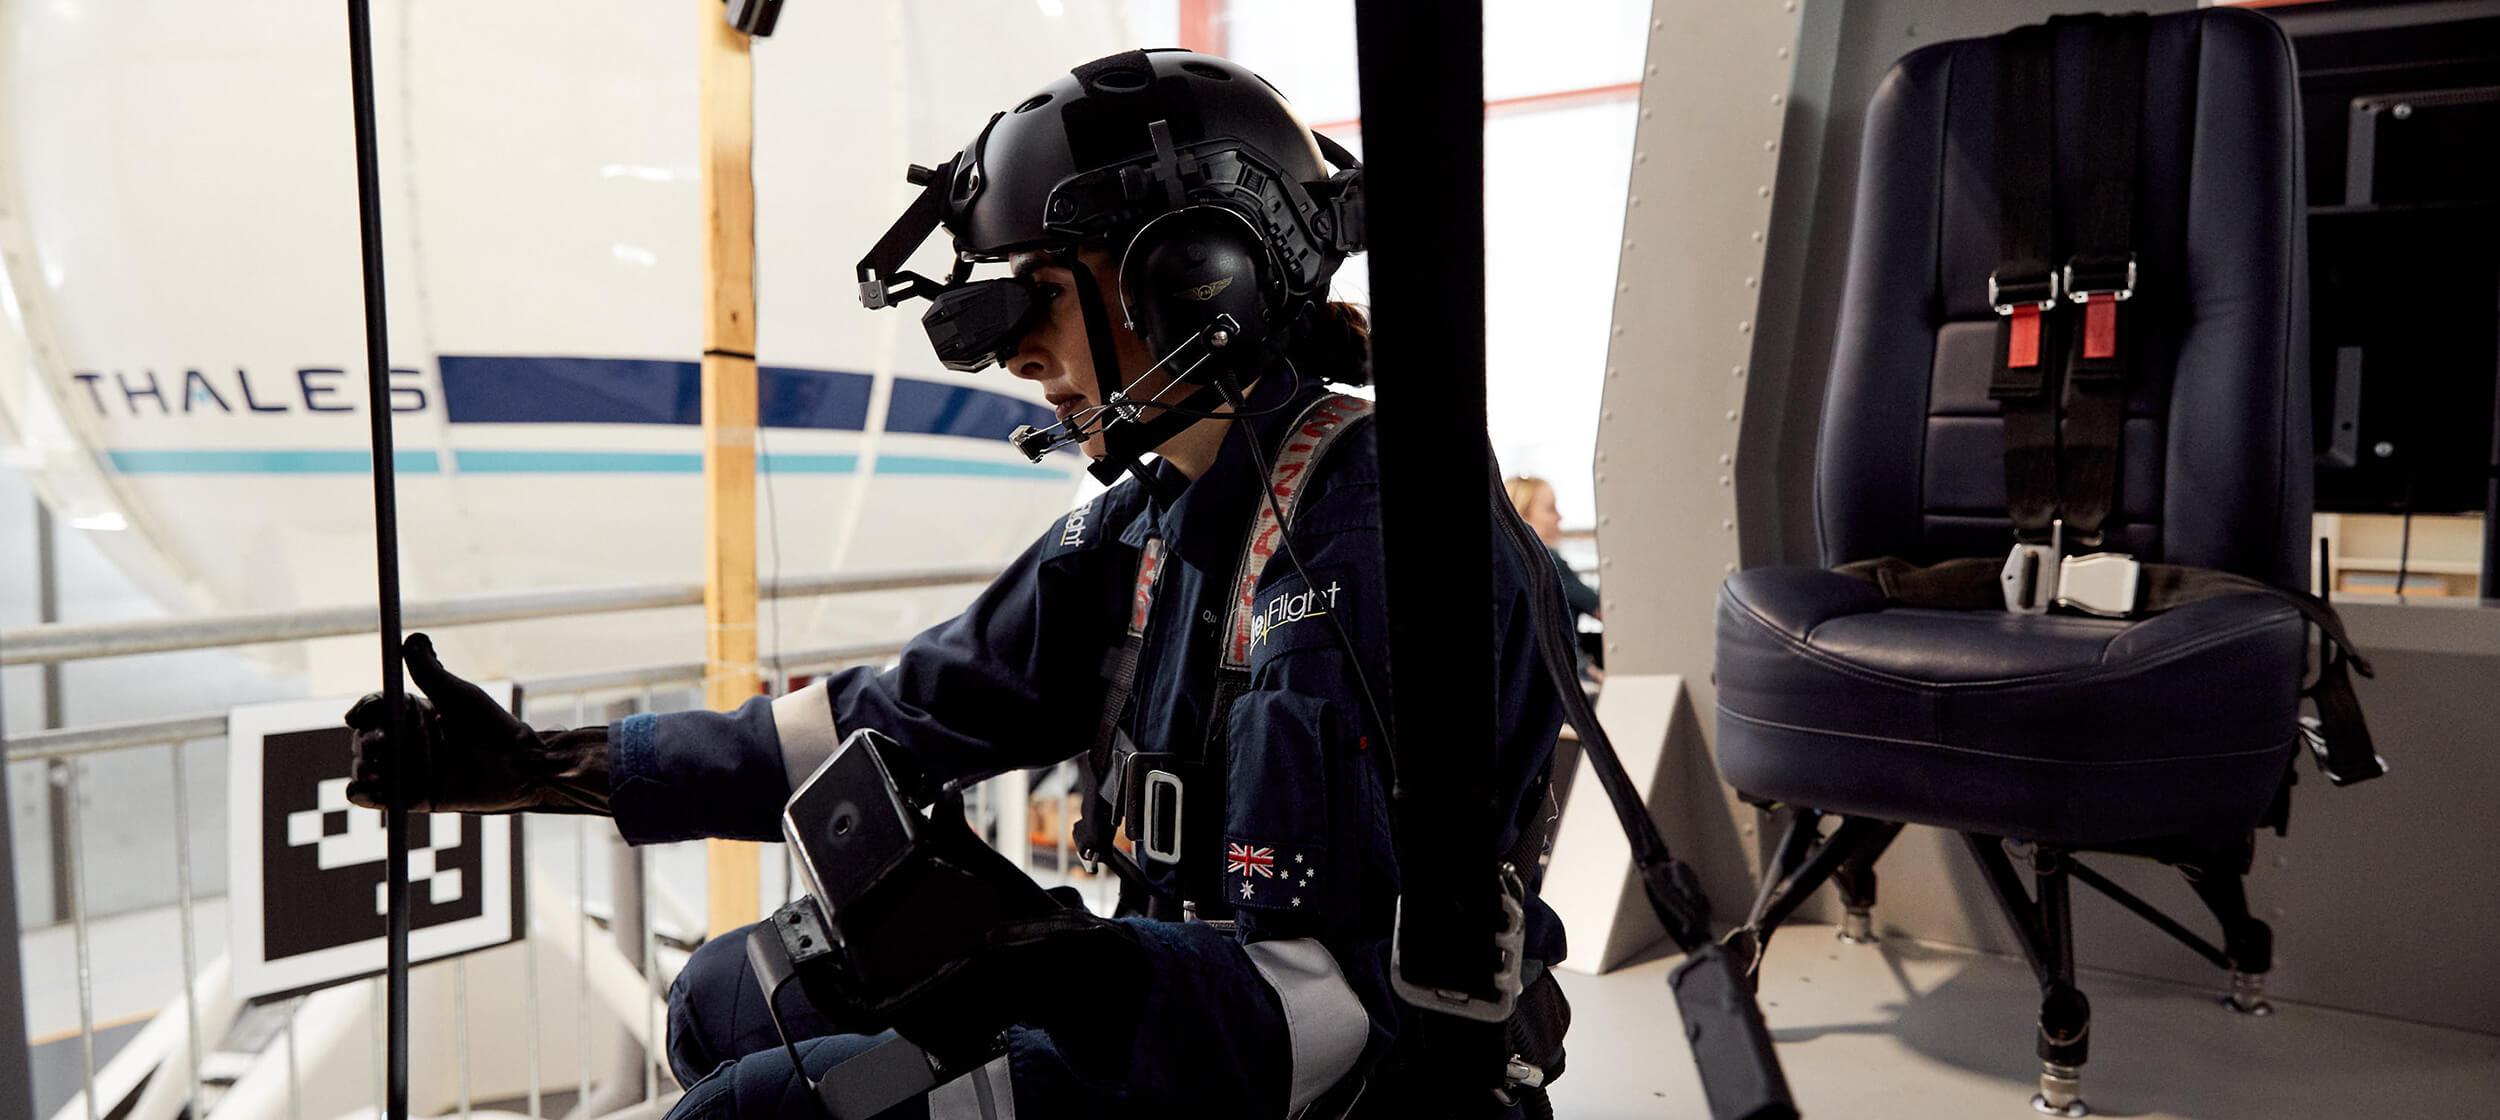 Thales aircrew training